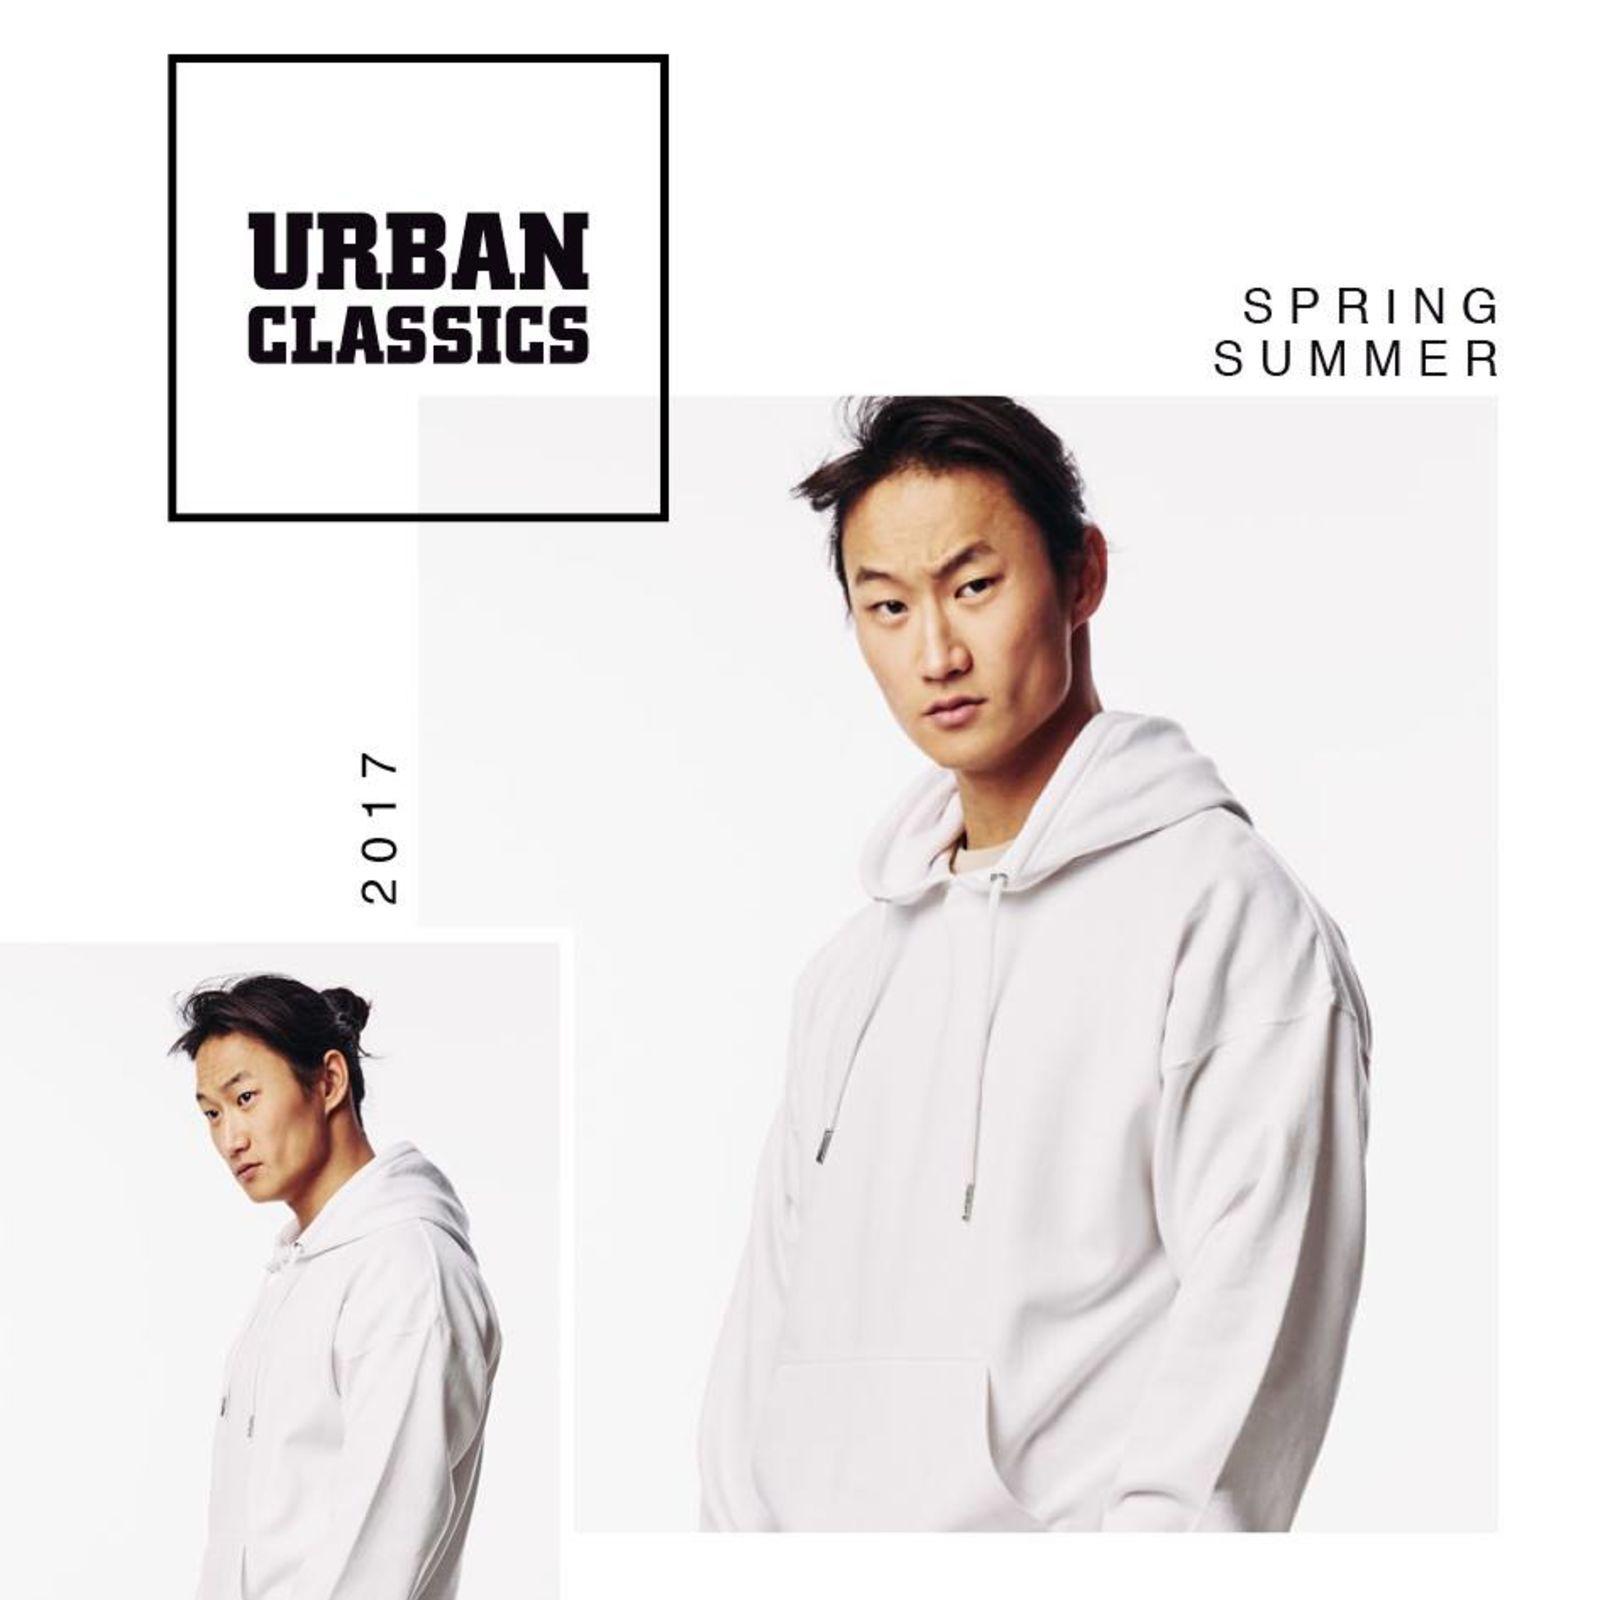 URBAN CLASSICS (Bild 2)